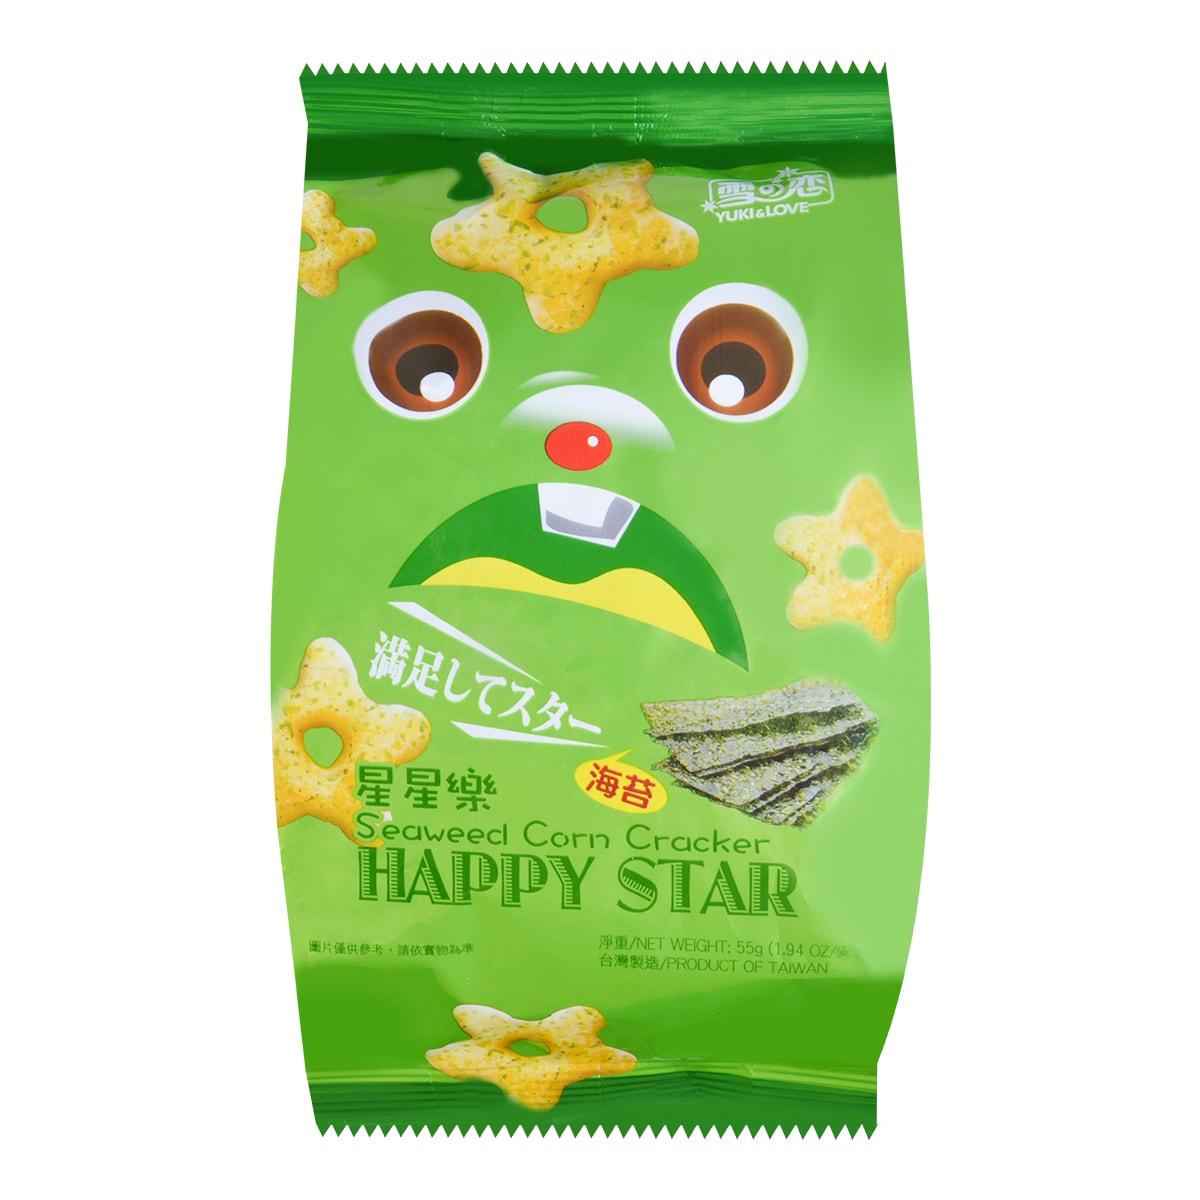 YUKI/LOVE Corn Cracker Seaweed Flavour 55g